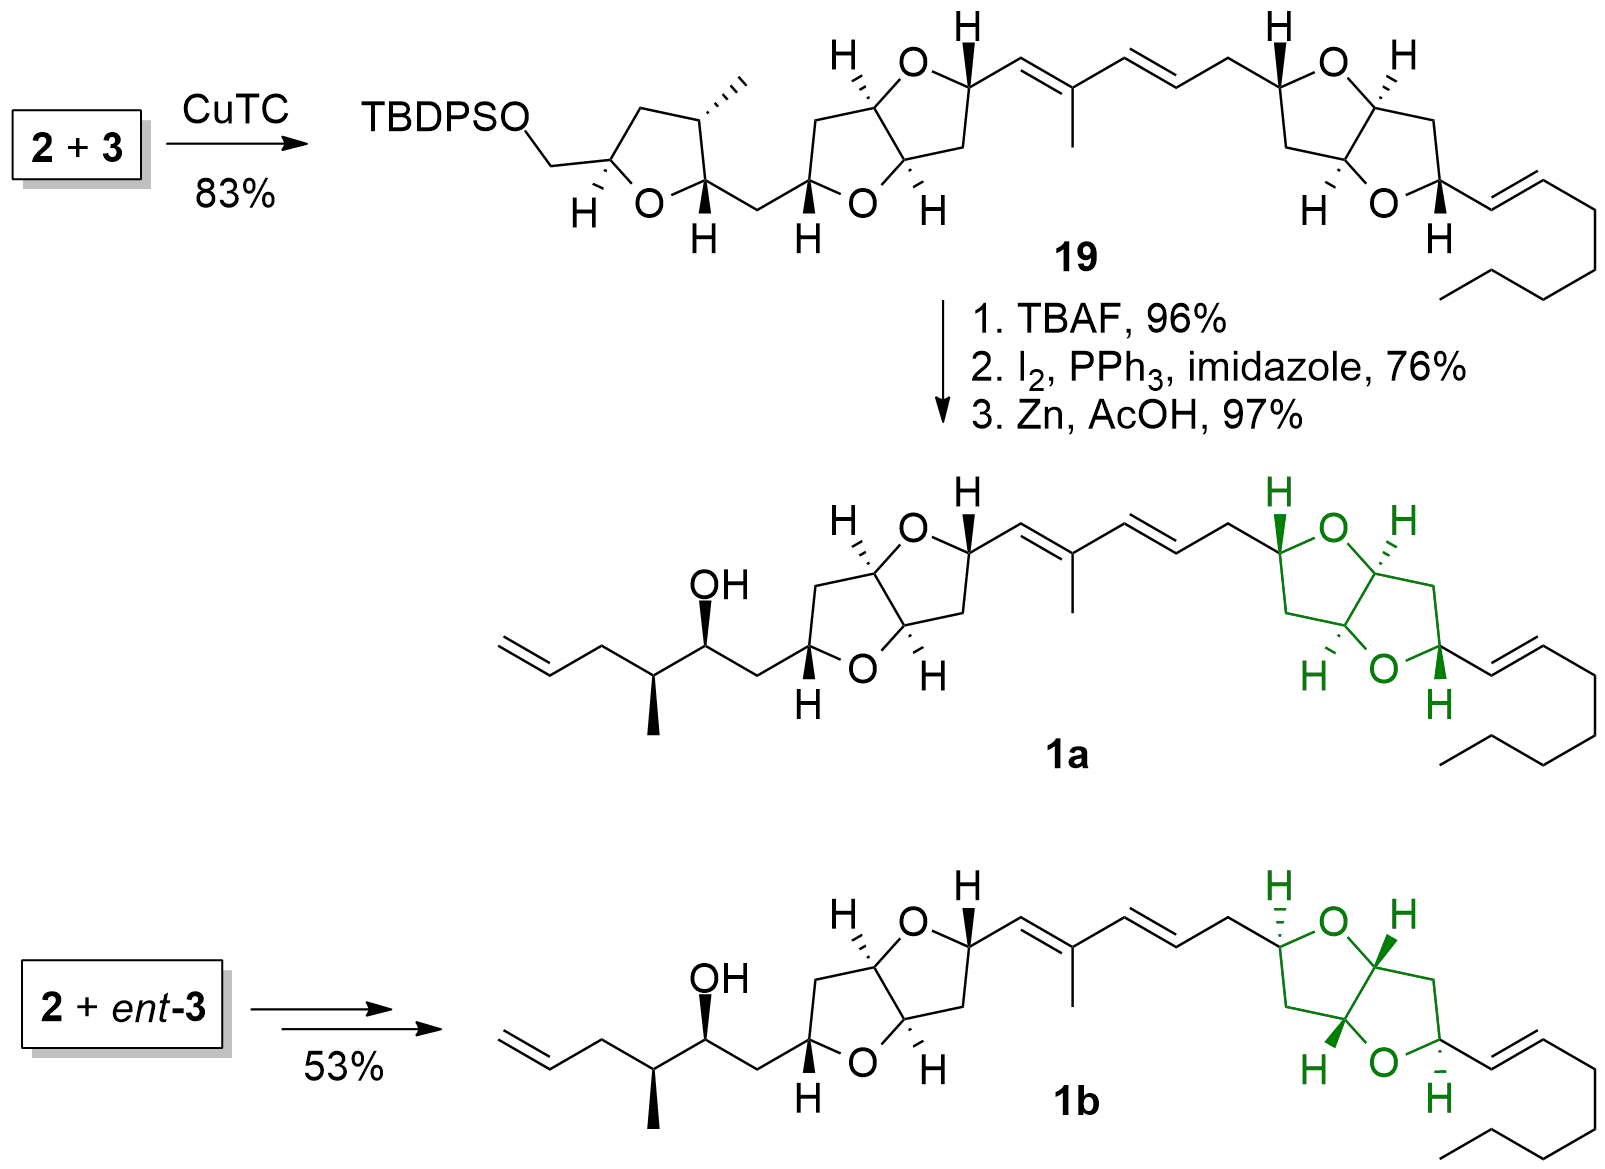 amphirionin2-4.png